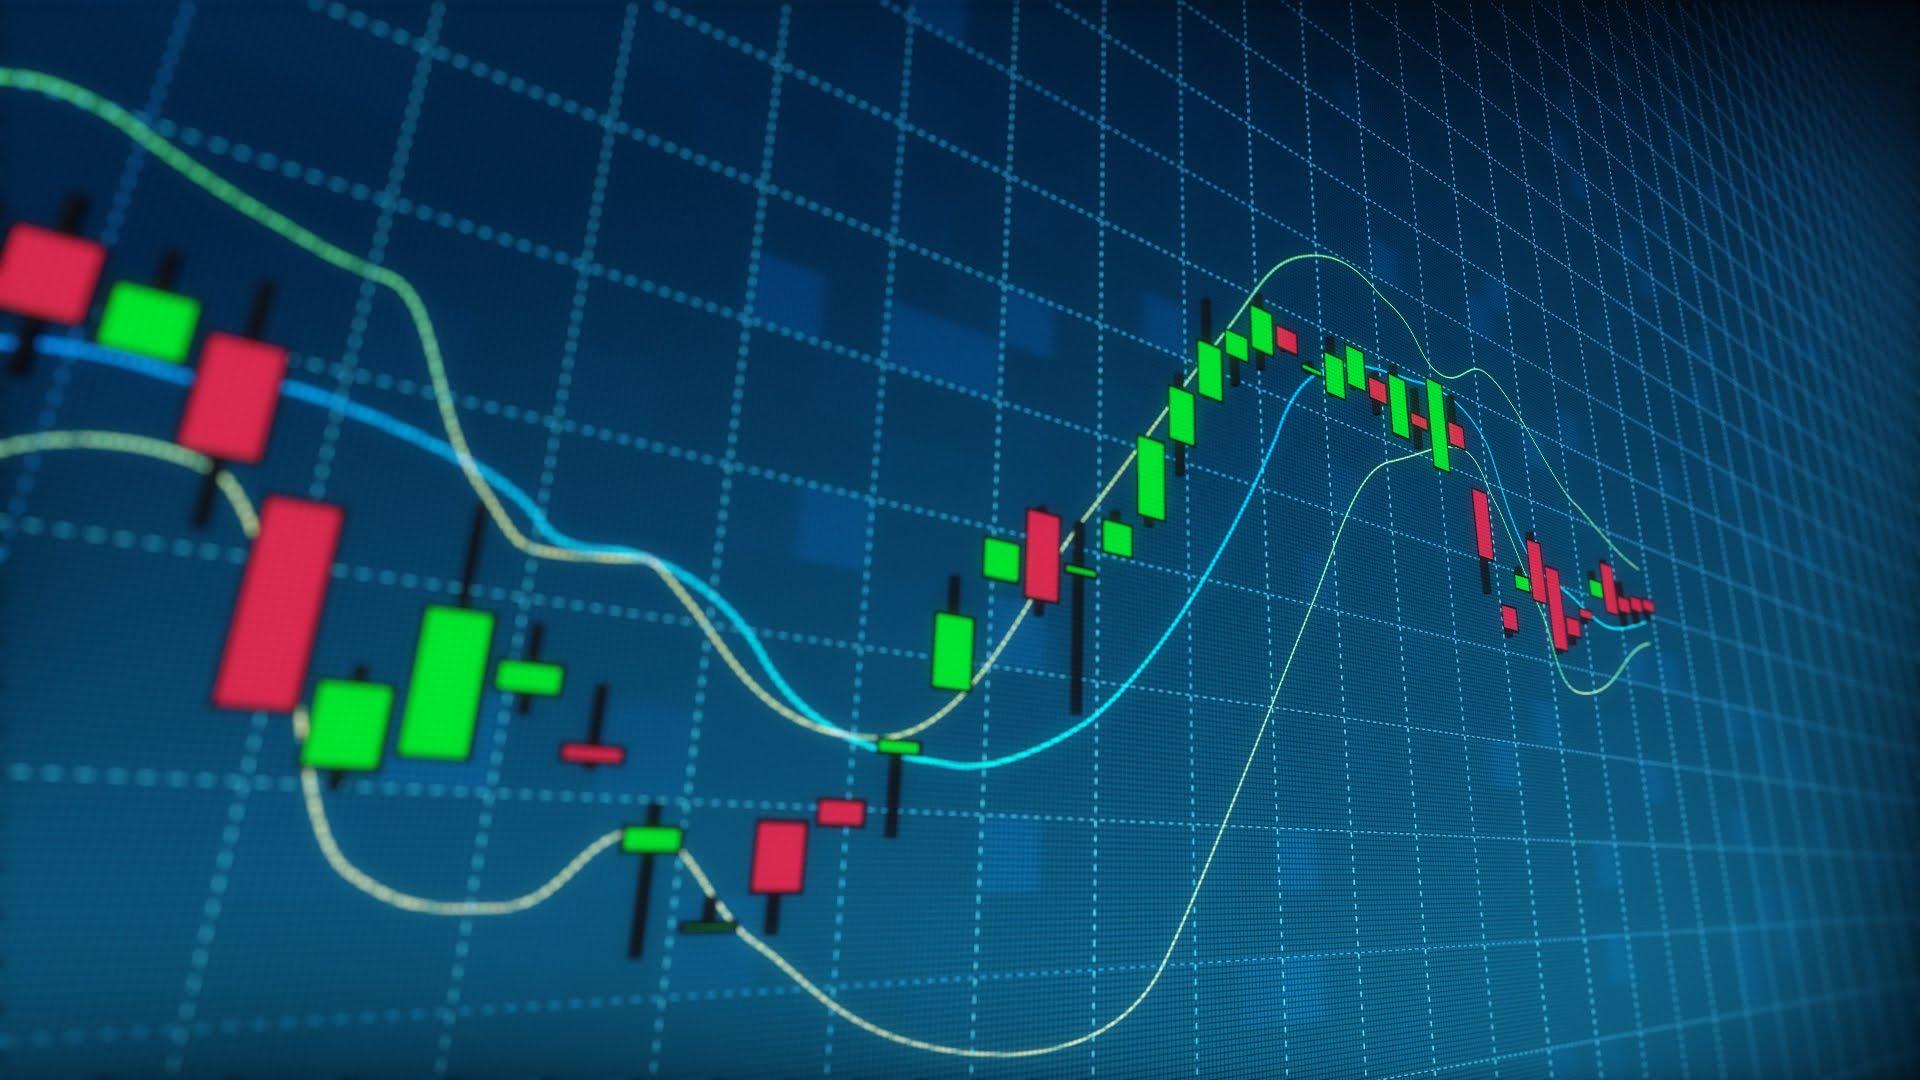 Stock Market Candlestick Data Graph - YouTube